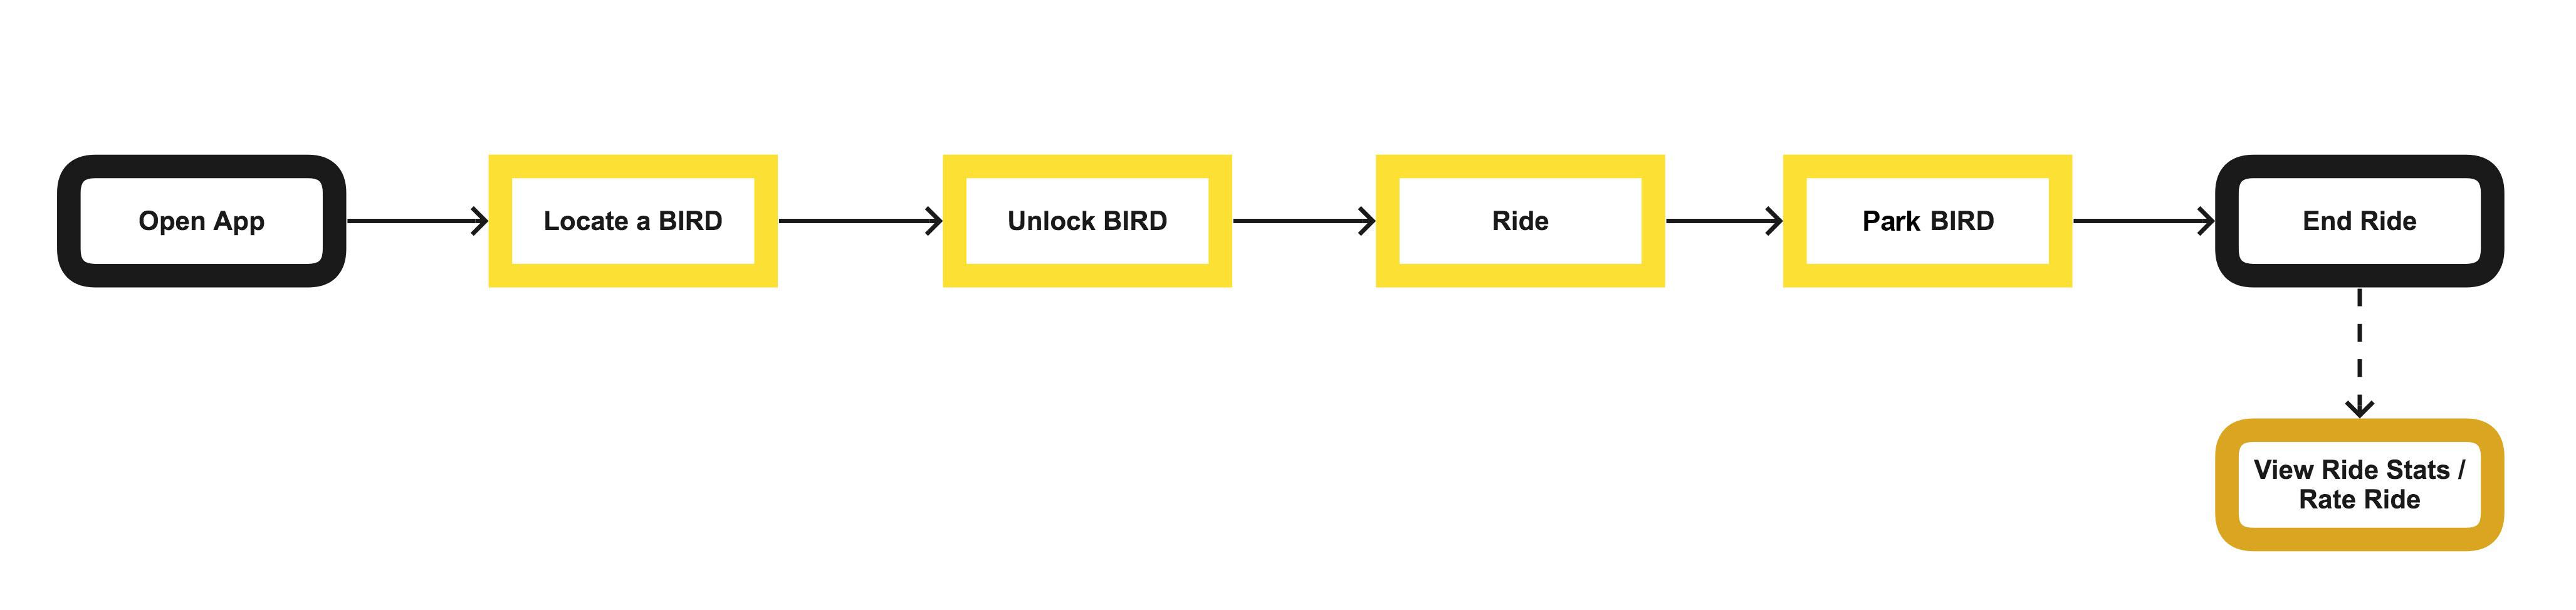 Task flow for Bird riders